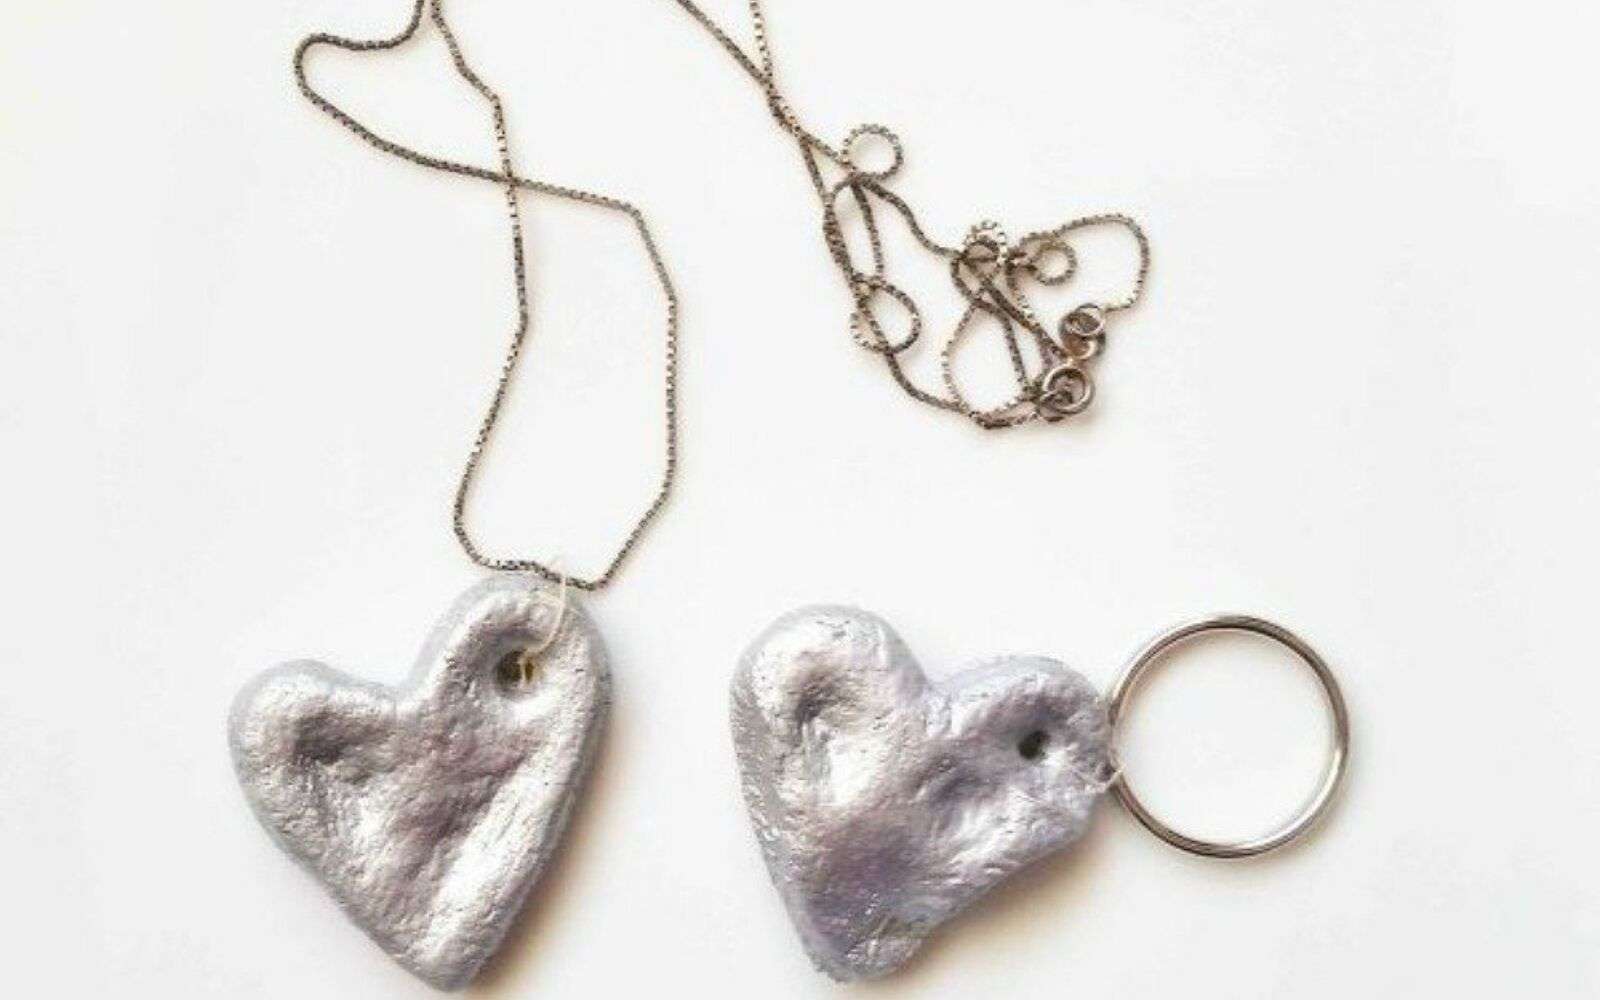 s 20 heartfelt valentine s day gifts for under 20, seasonal holiday decor, valentines day ideas, Shape salt dough into thumbprint hearts